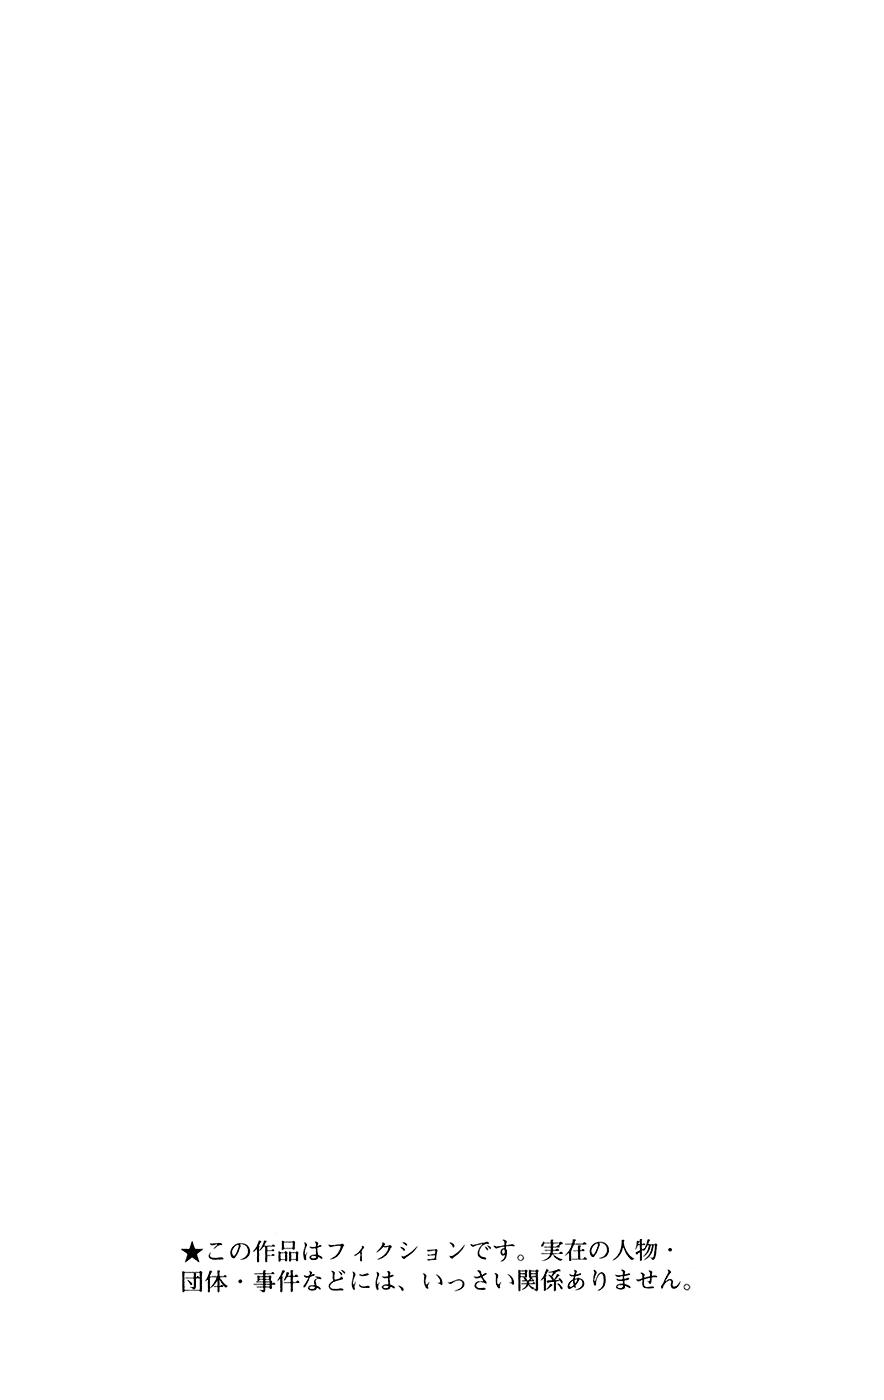 Манга Любовные неприятности / To Love-Ru  - Том 14 Глава 116 Страница 8